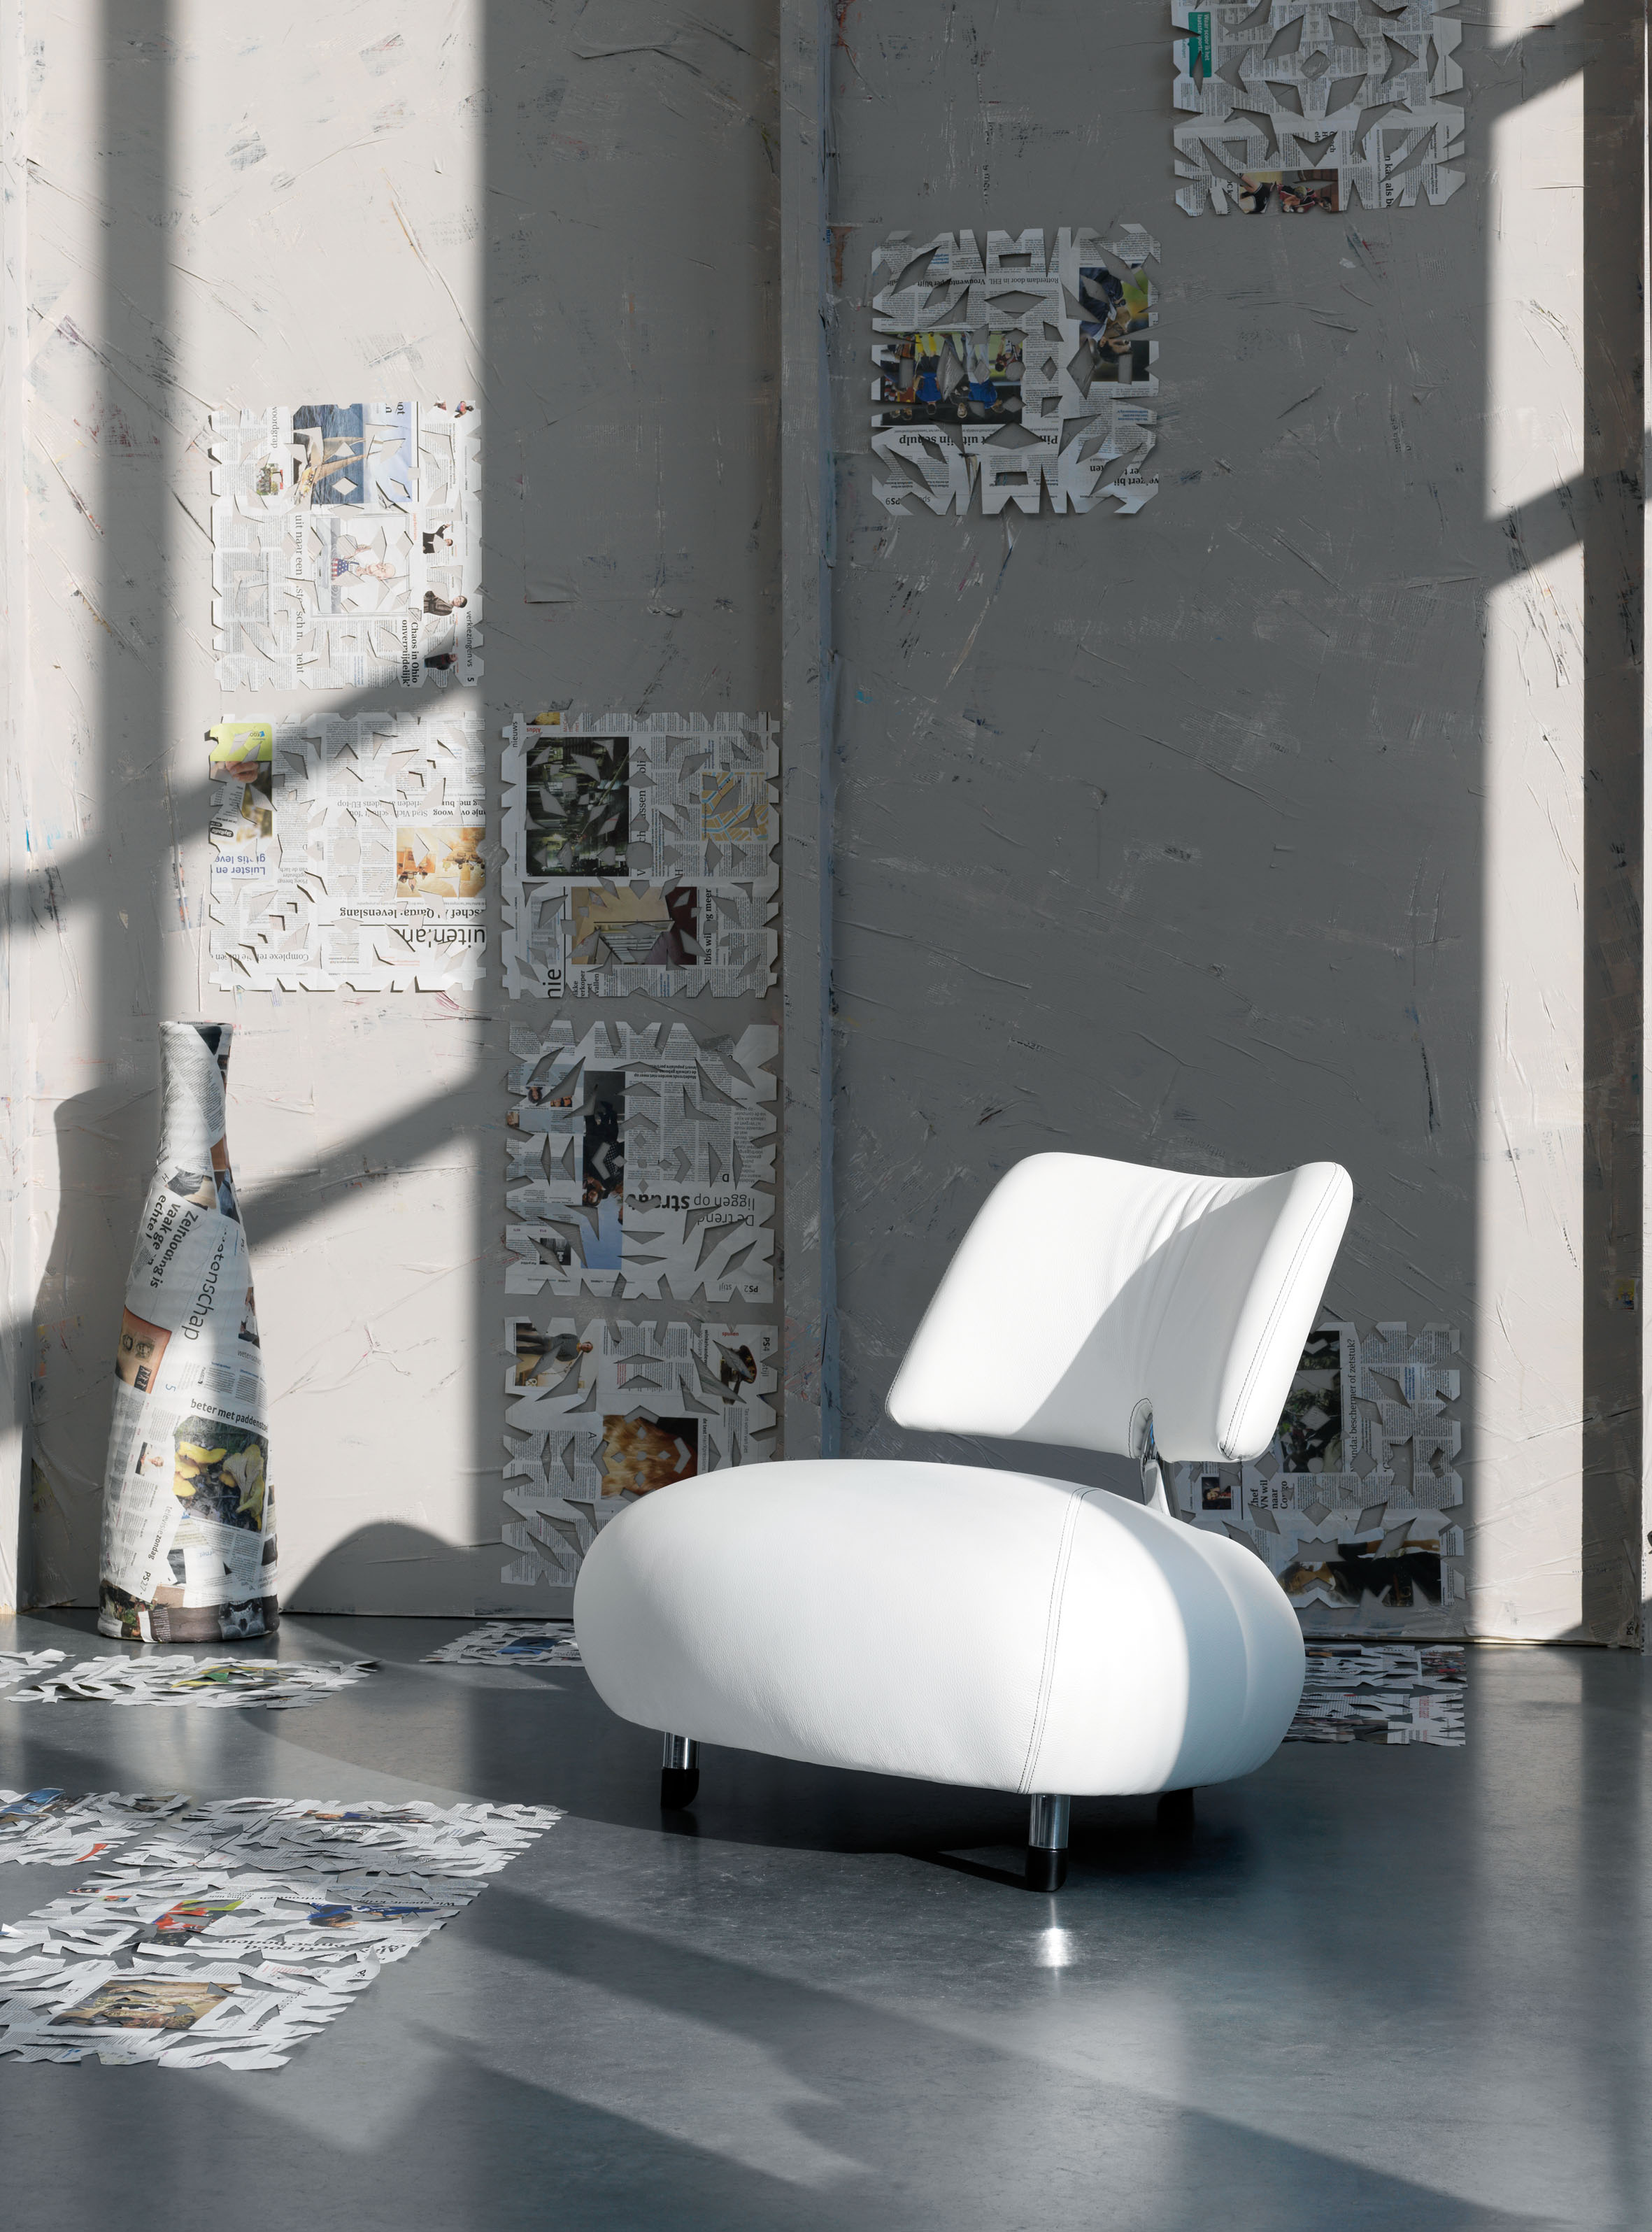 Der perfekte designer sessel mobelideen fur exklusives wohnambiente